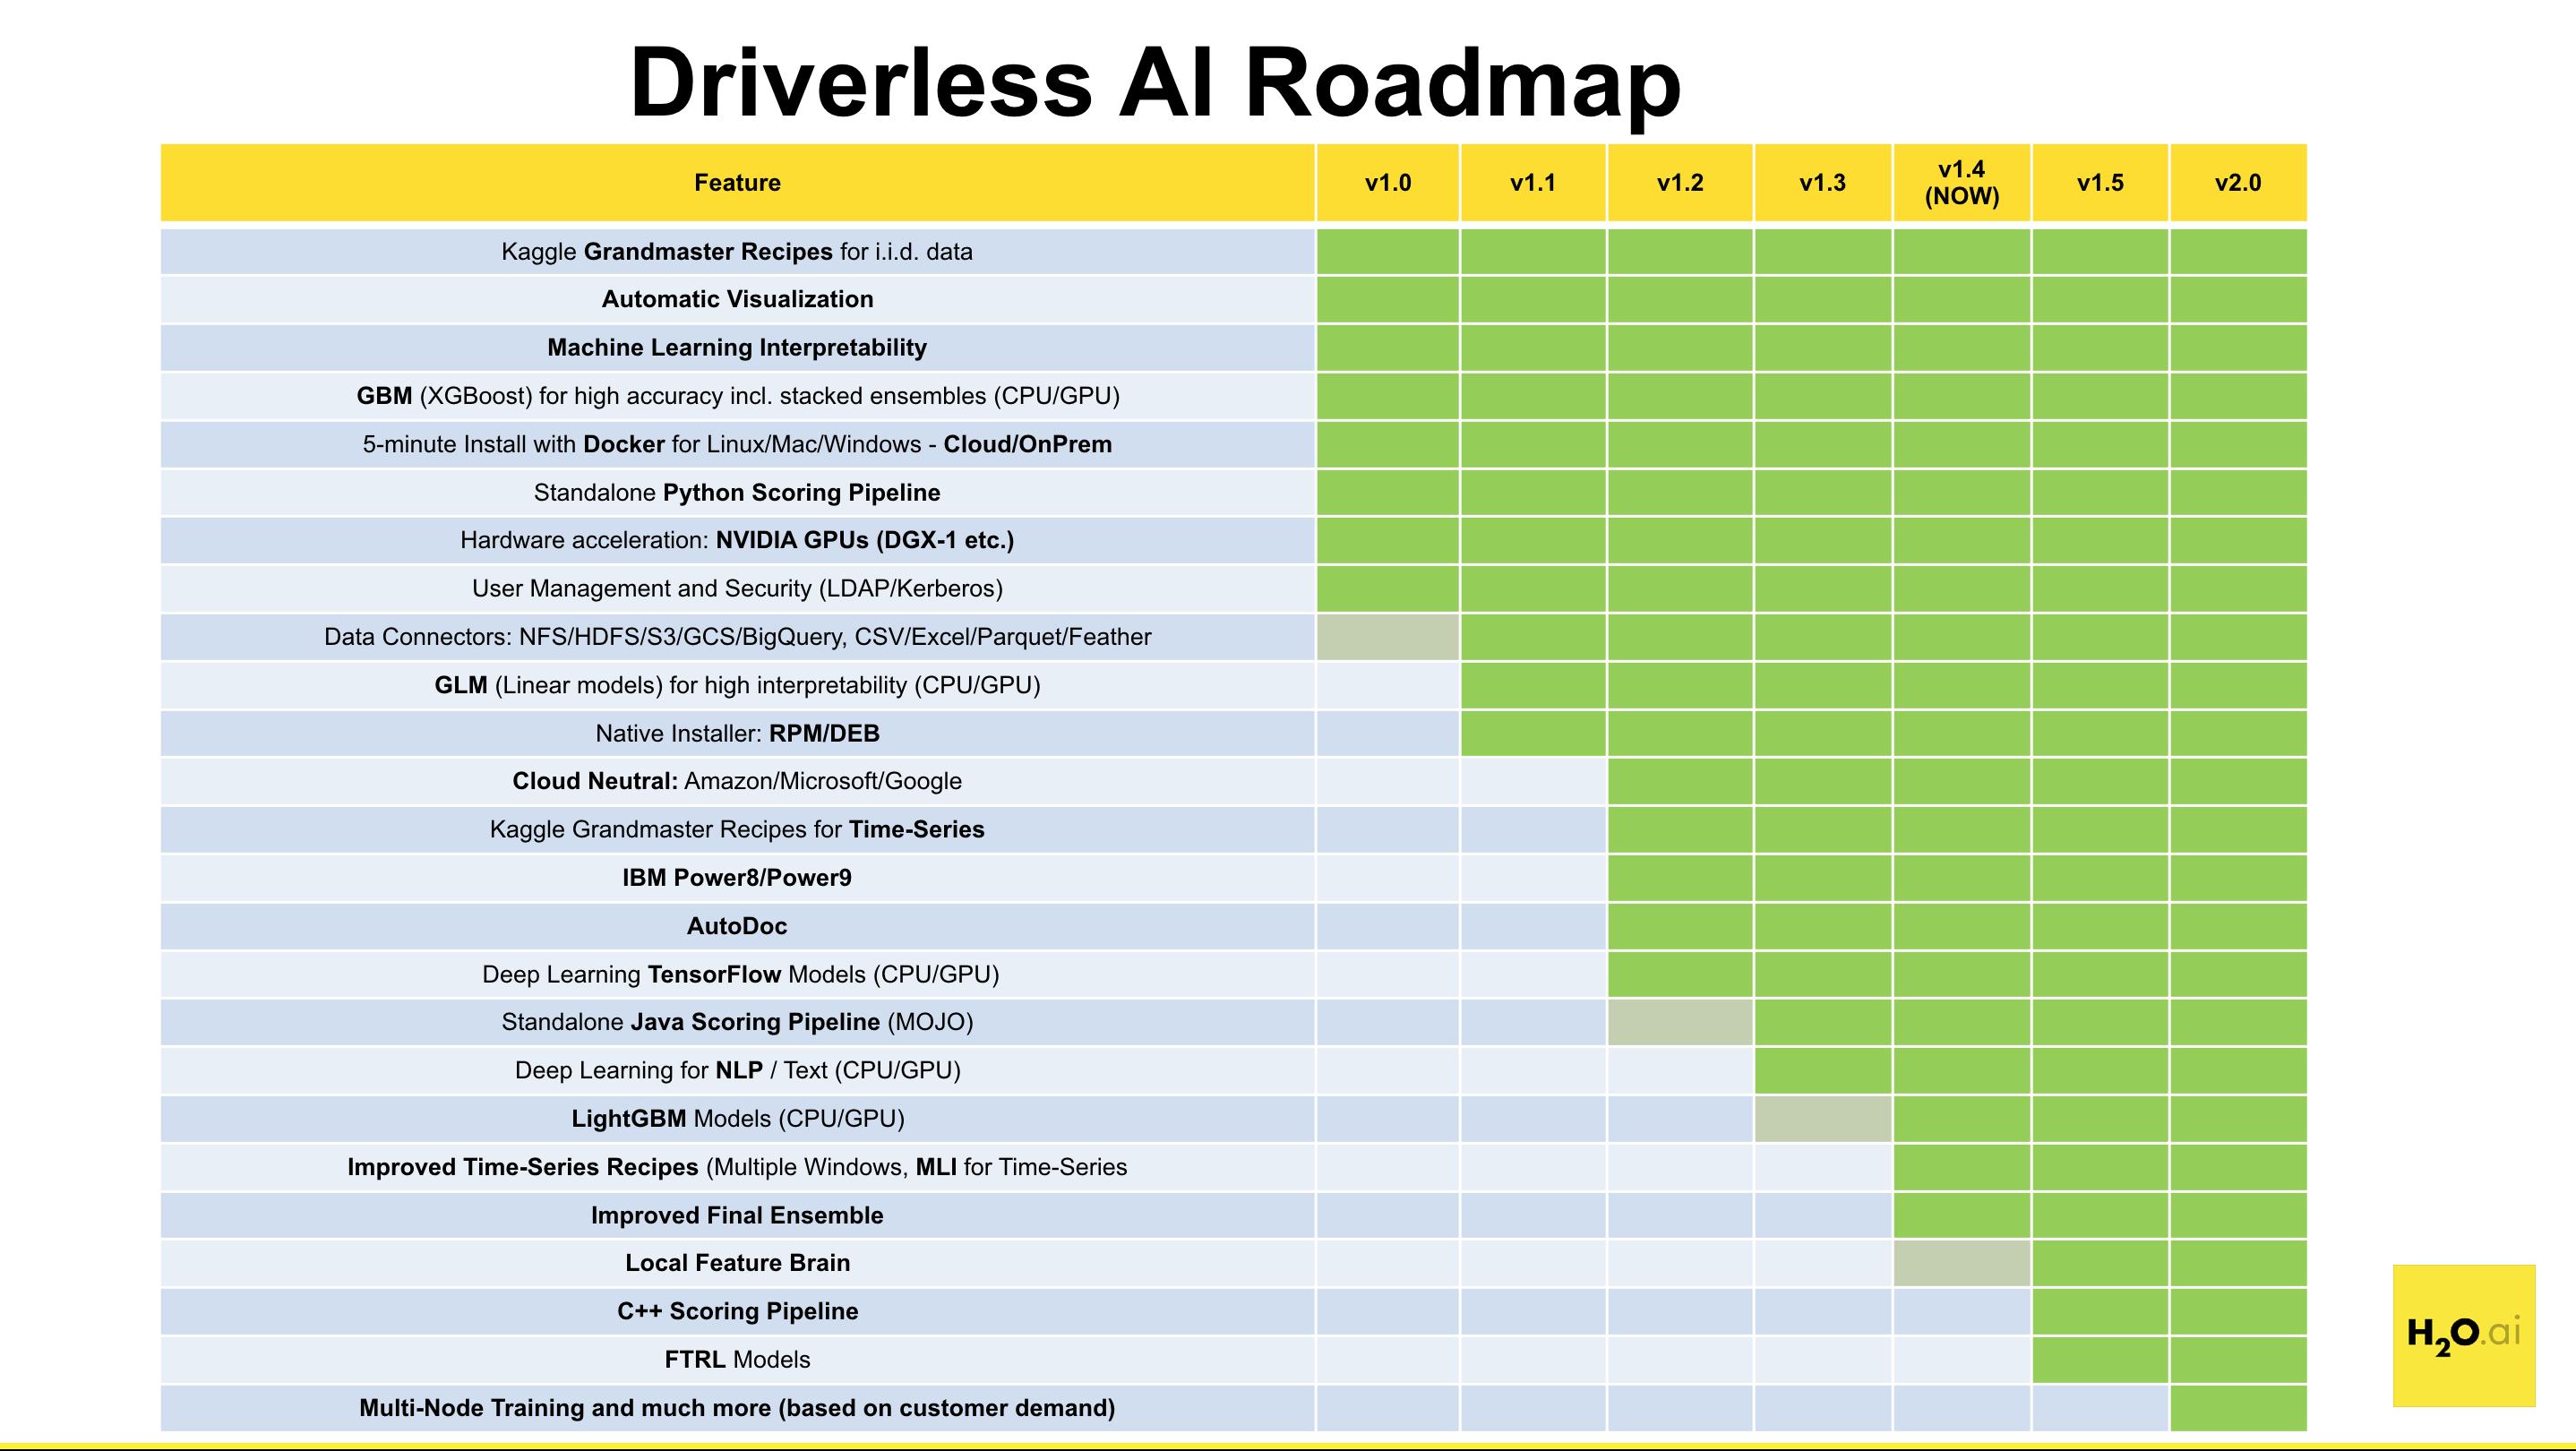 H2O Driverless AI Release Notes — Using Driverless AI 1 4 2